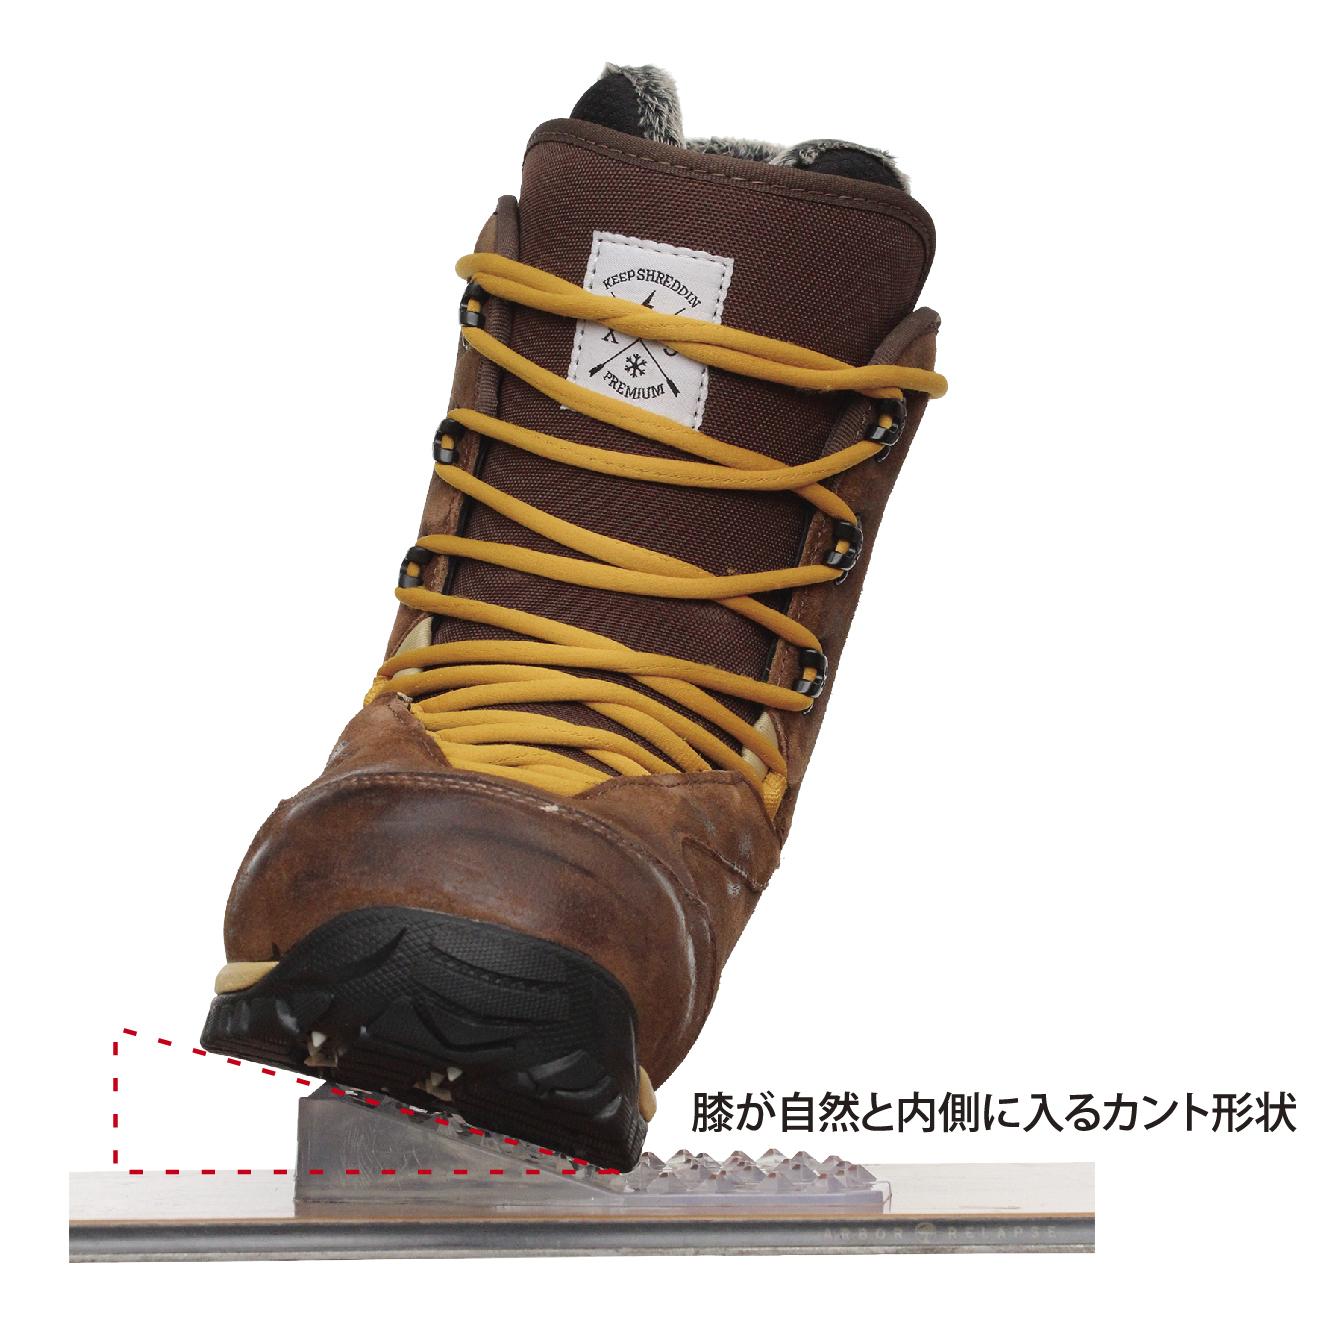 #110872_Surf stomp pad / 全3色